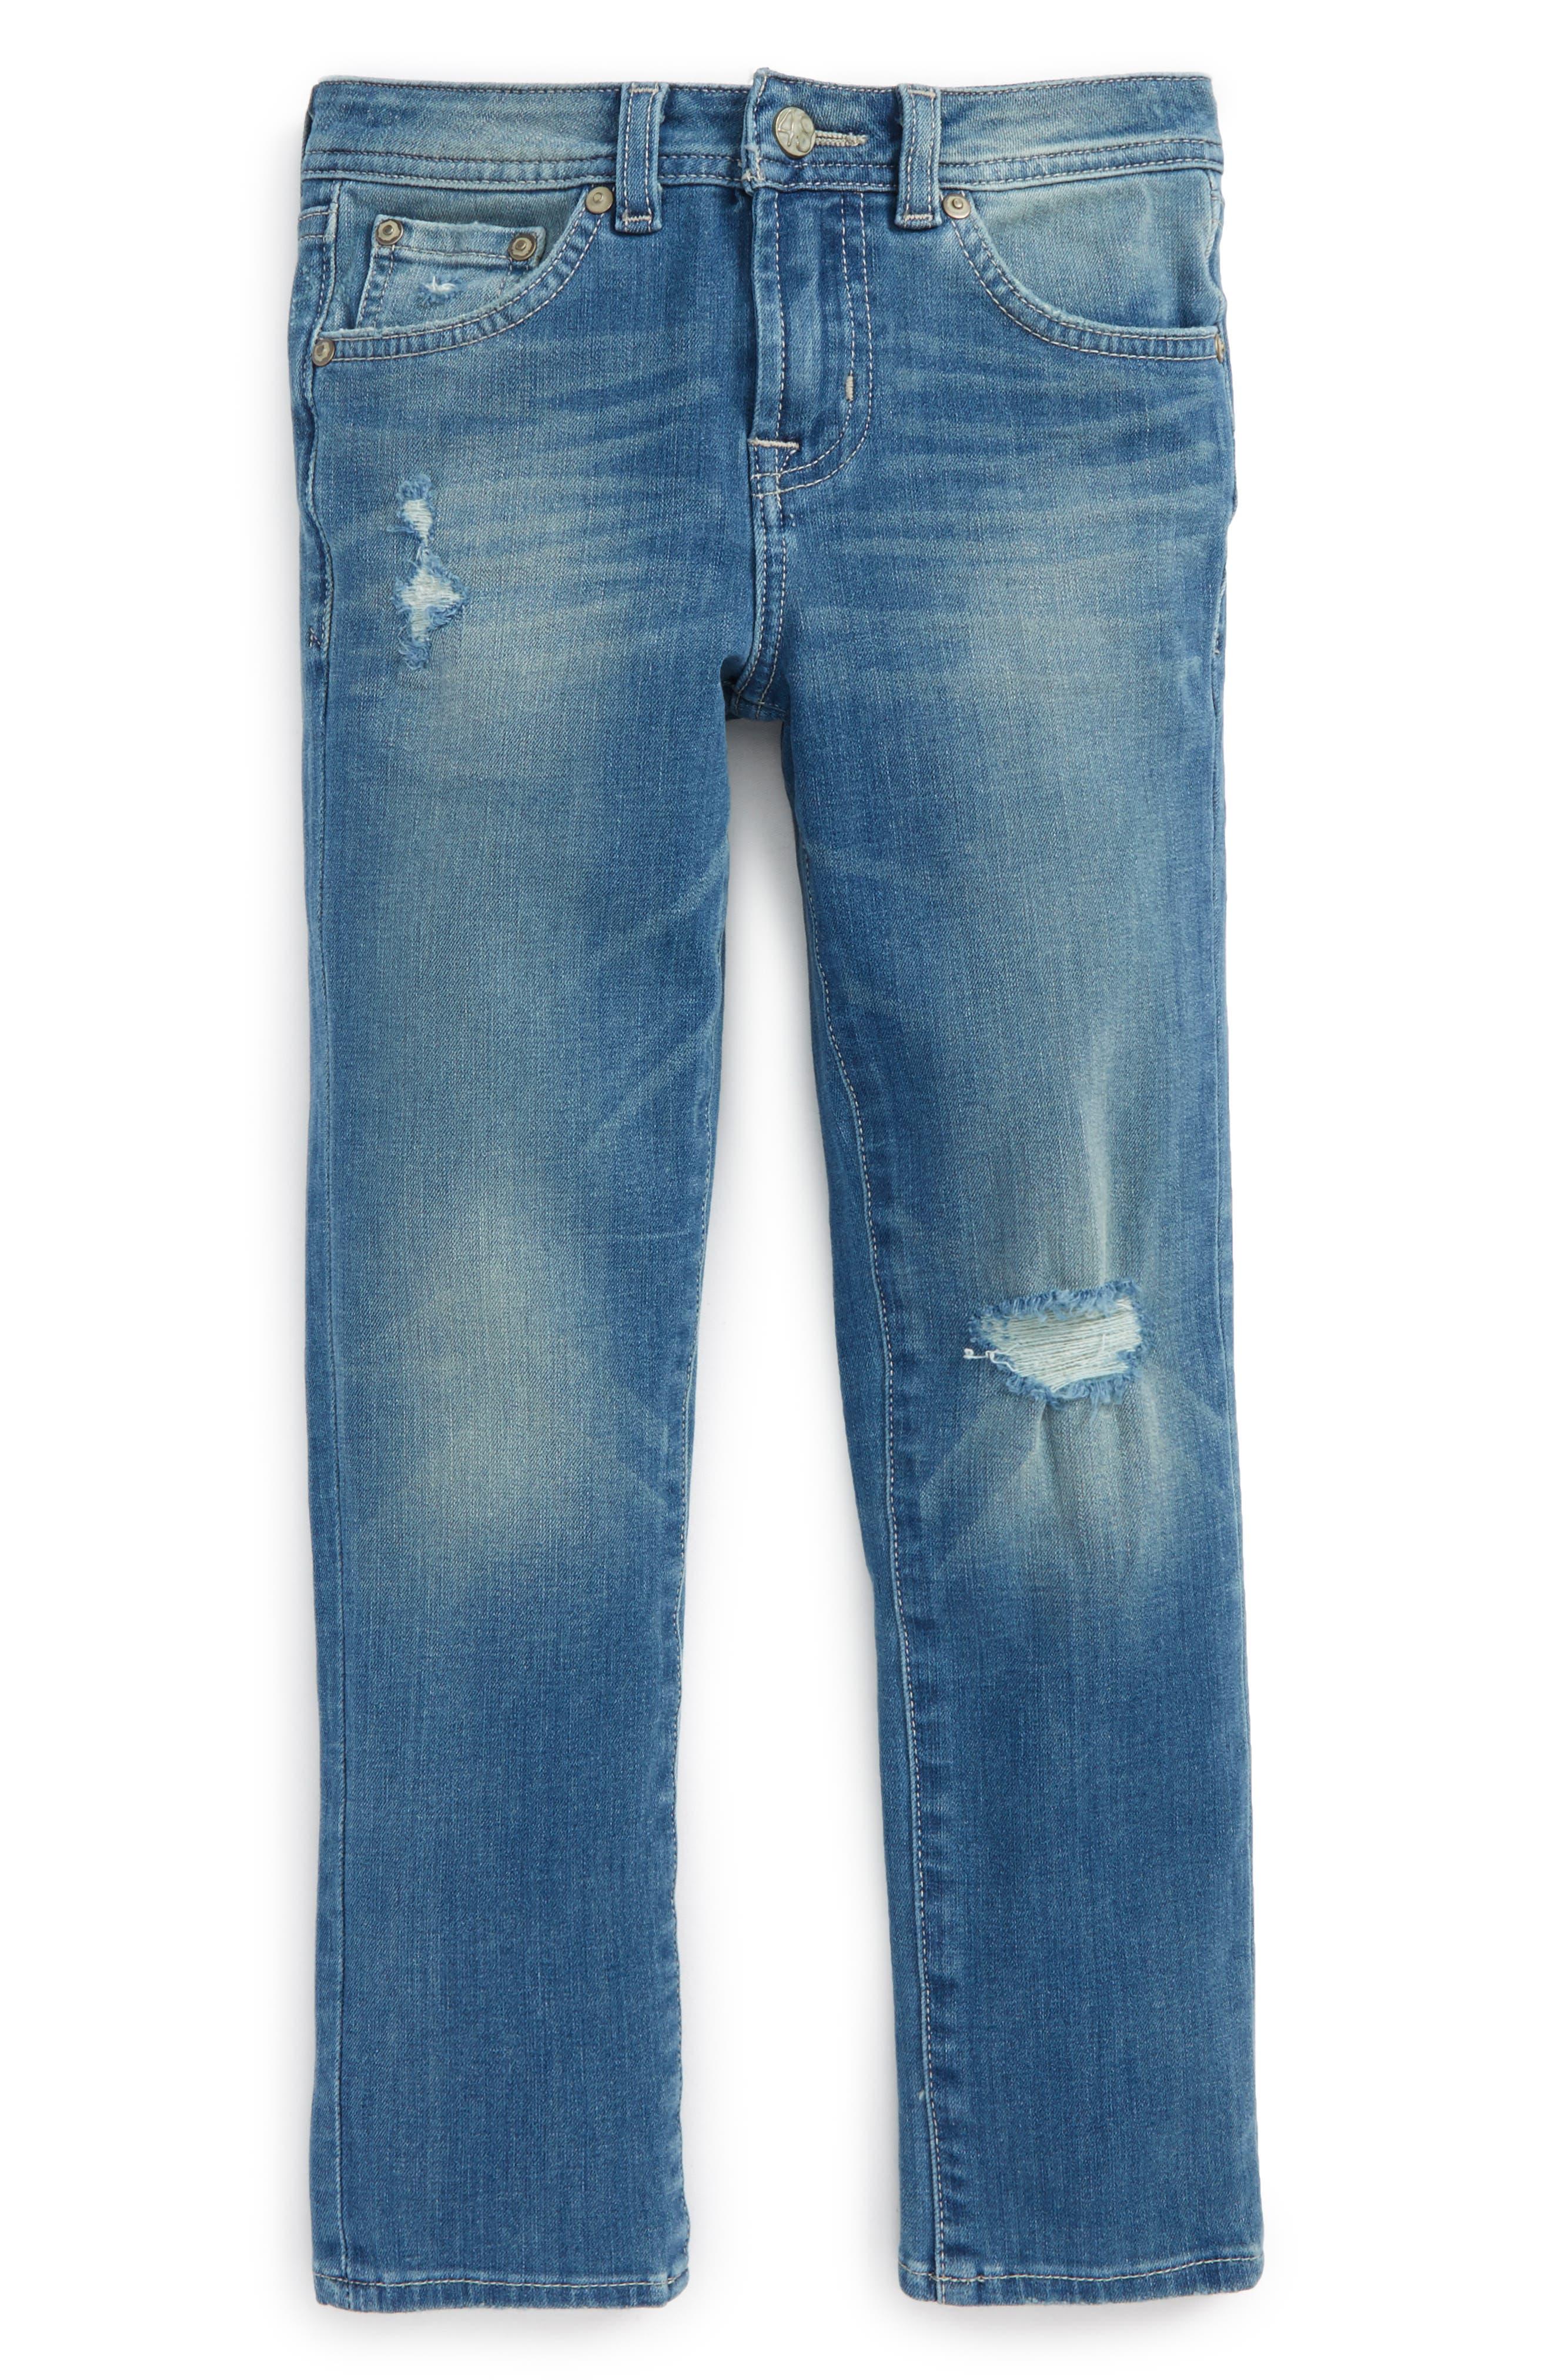 ag adriano goldschmied kids The Noah Slim Straight Leg Jeans (Toddler Boys & Little Boys)